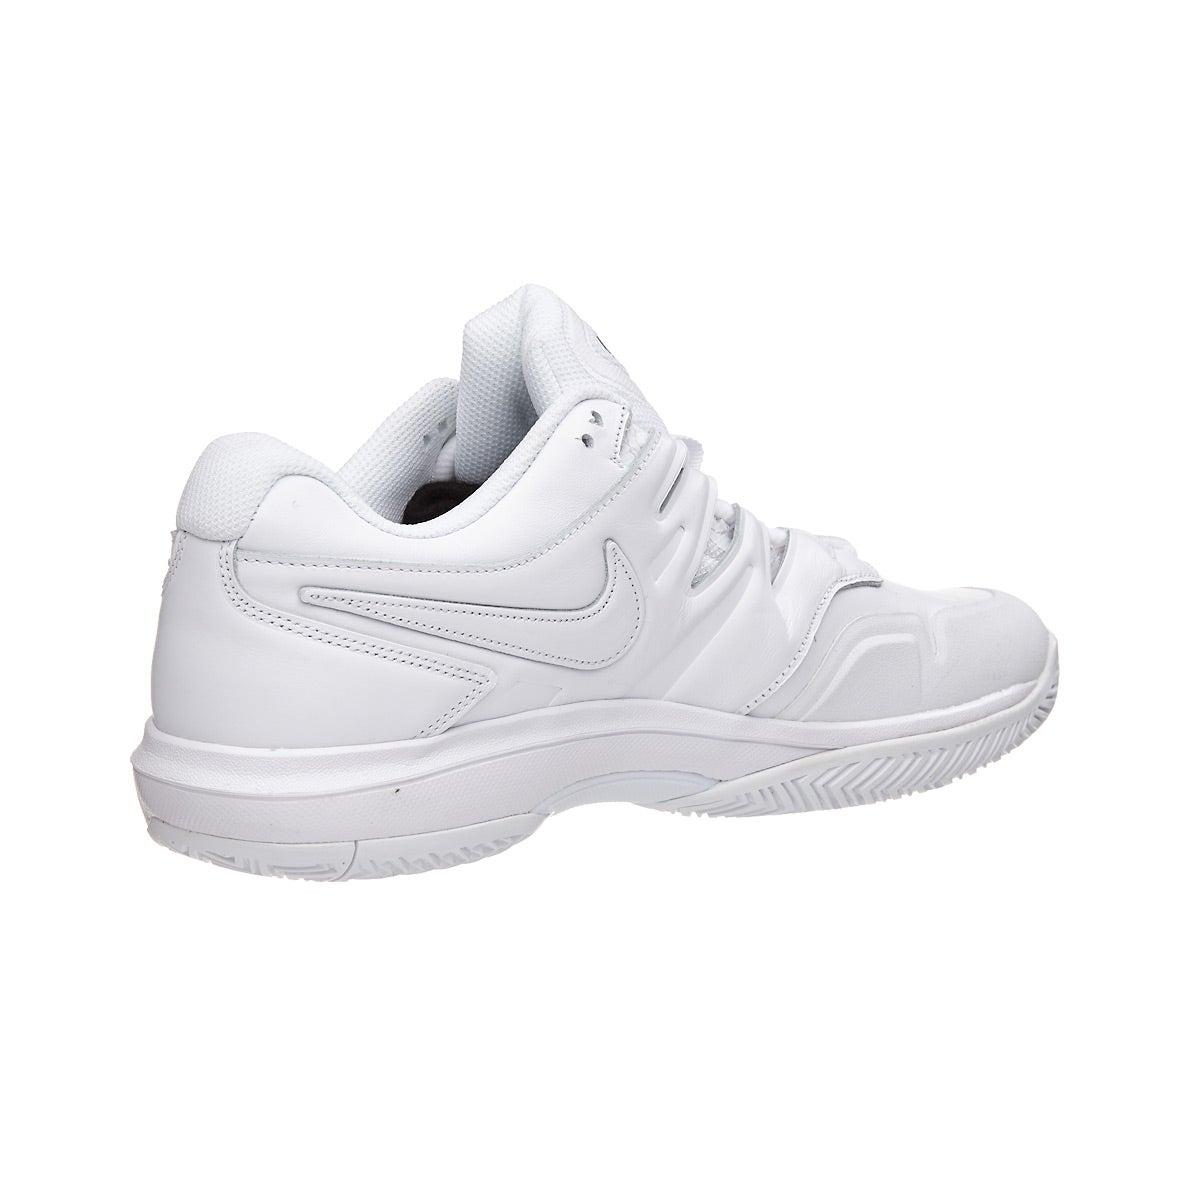 ad9c6d86e9a2 Nike Air Zoom Prestige Leather White Men s Shoe 360° View